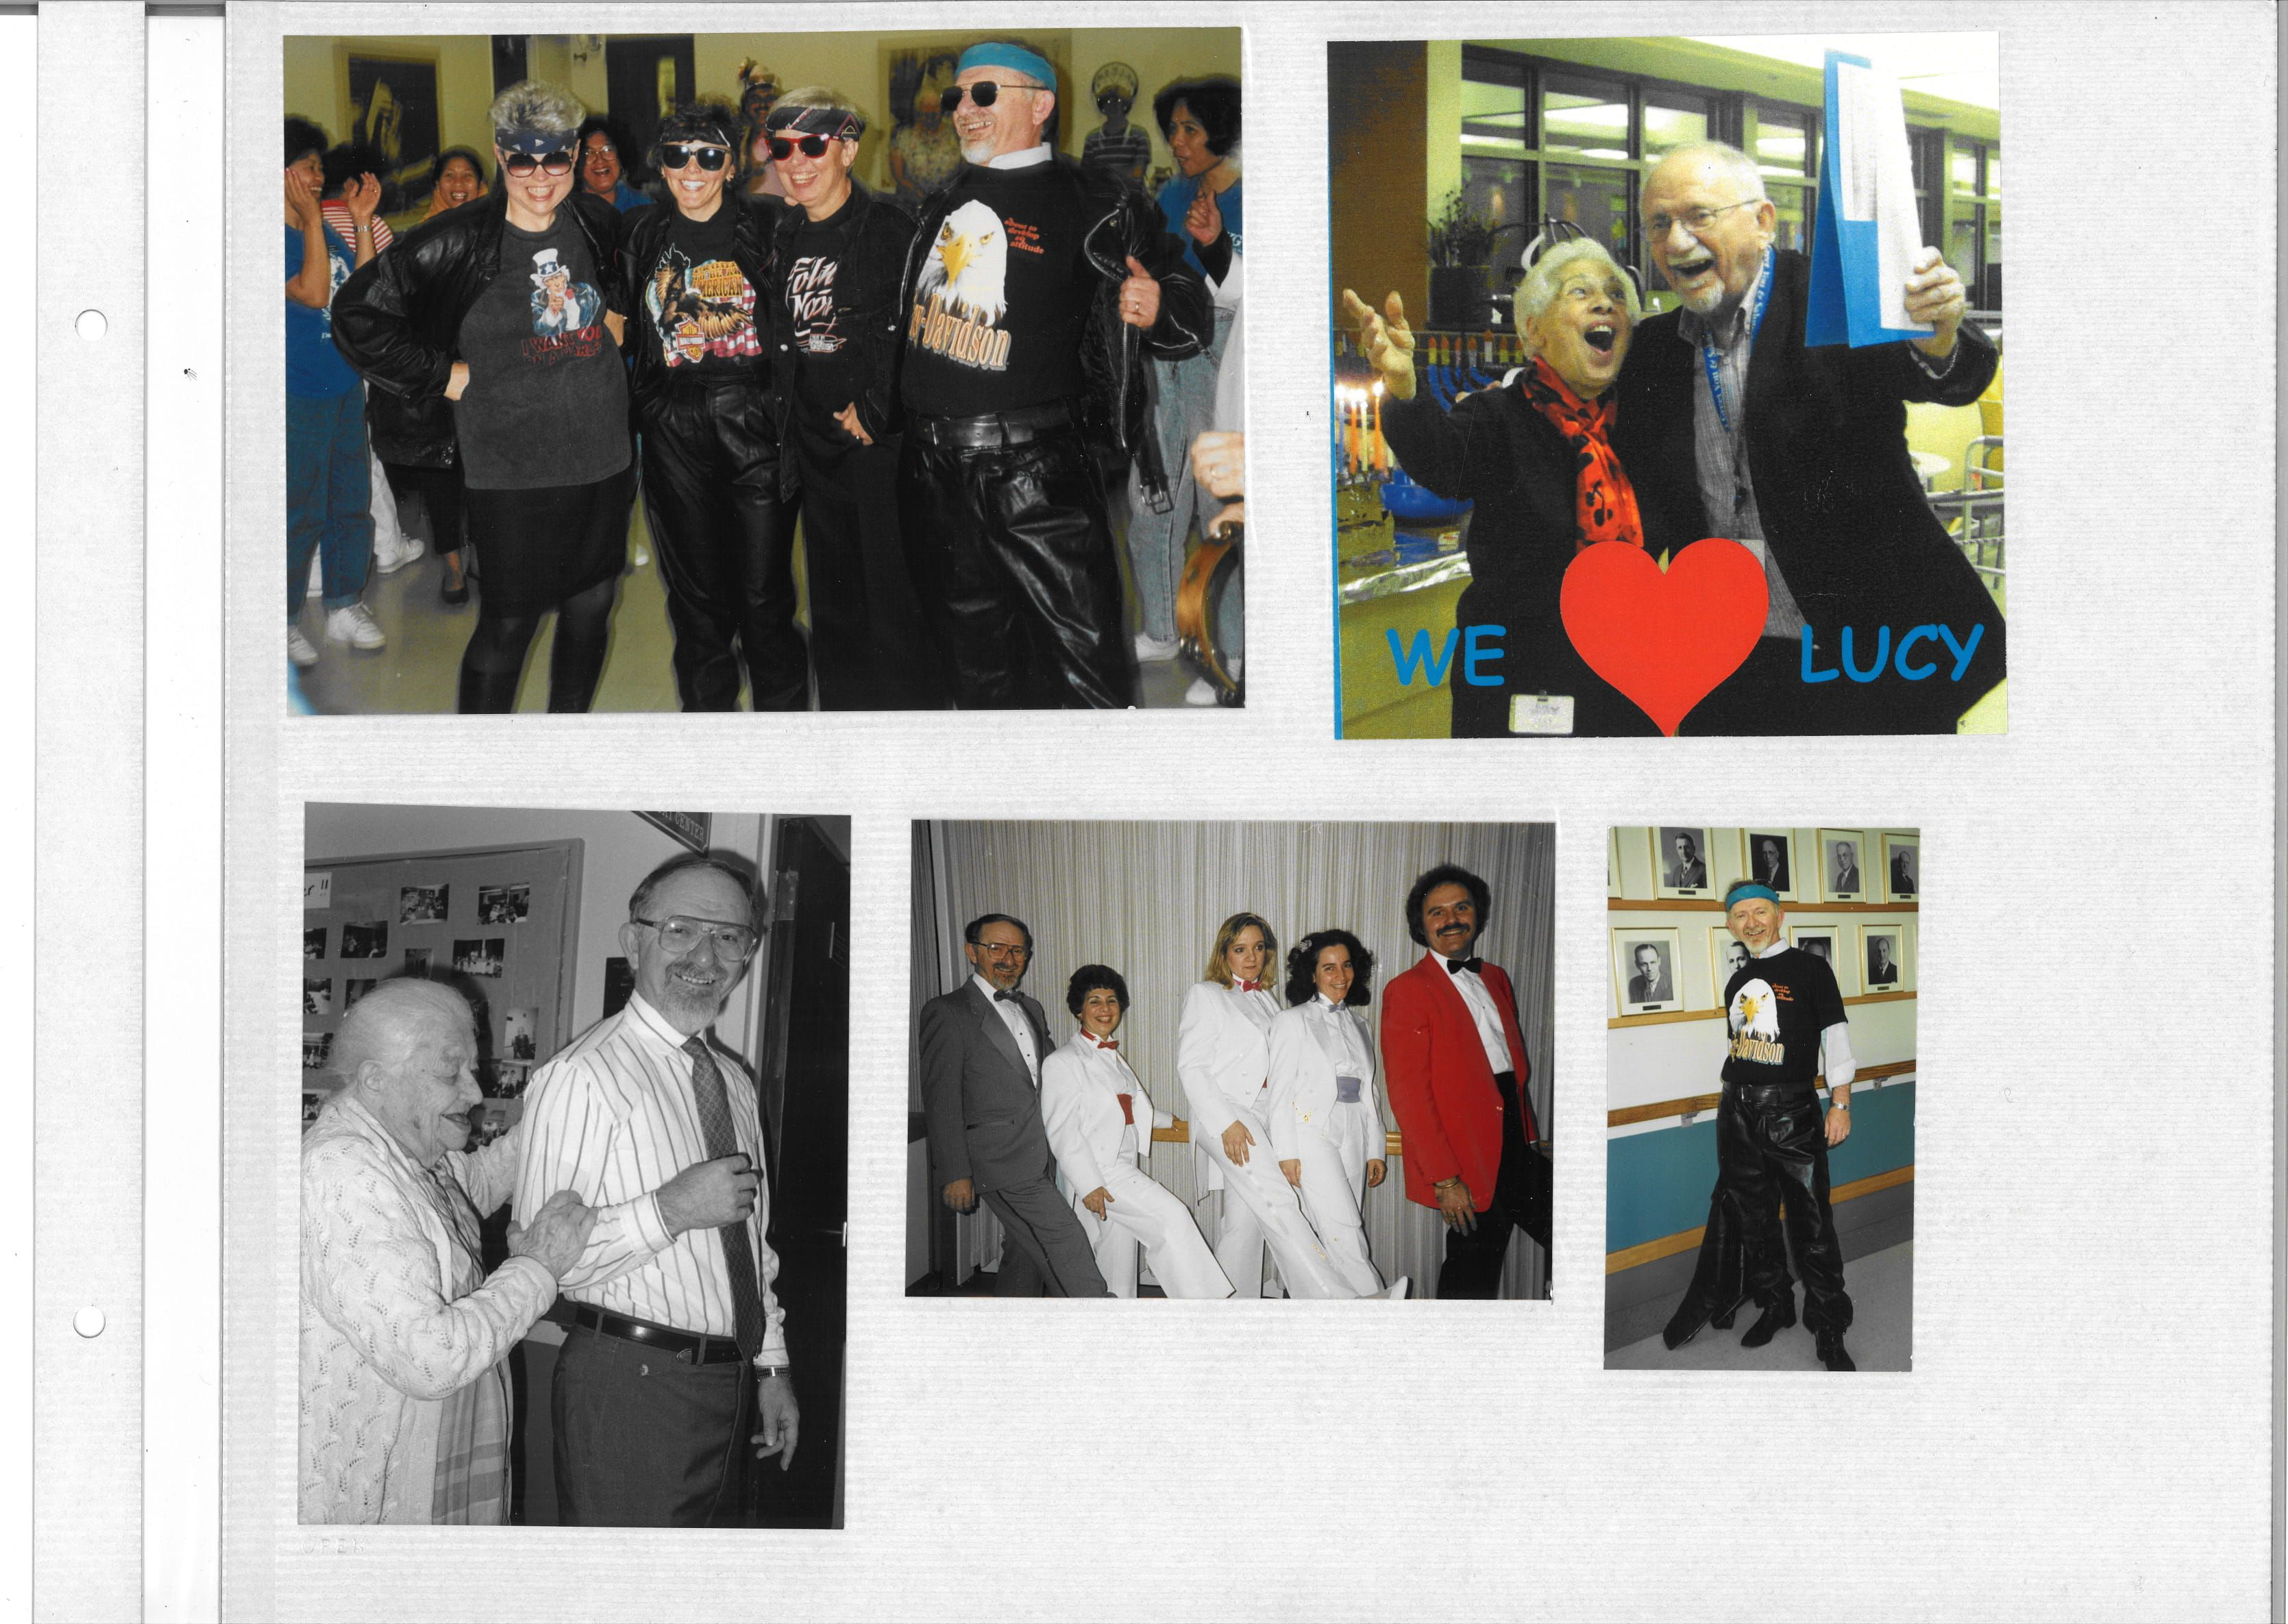 Photos from Purim